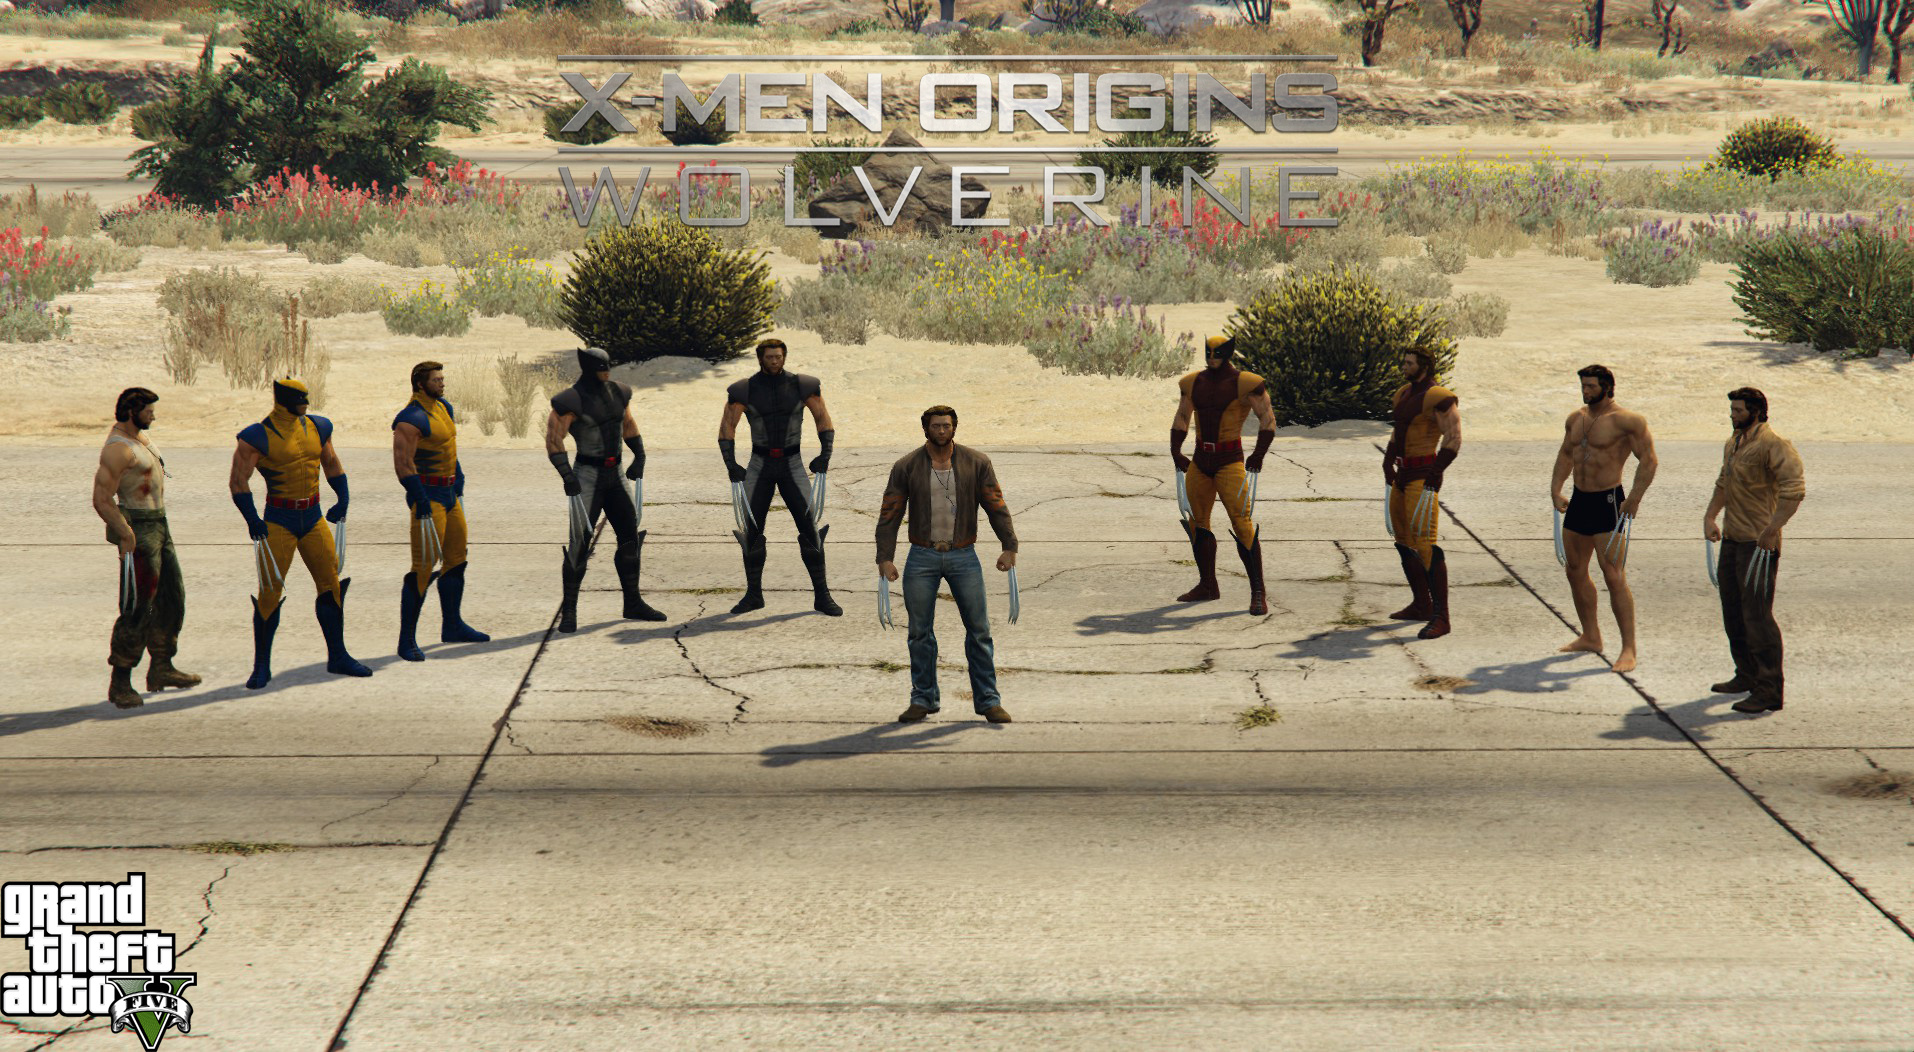 Wolverine: X-Men Origins Pack [Add-On] - GTA5-Mods com